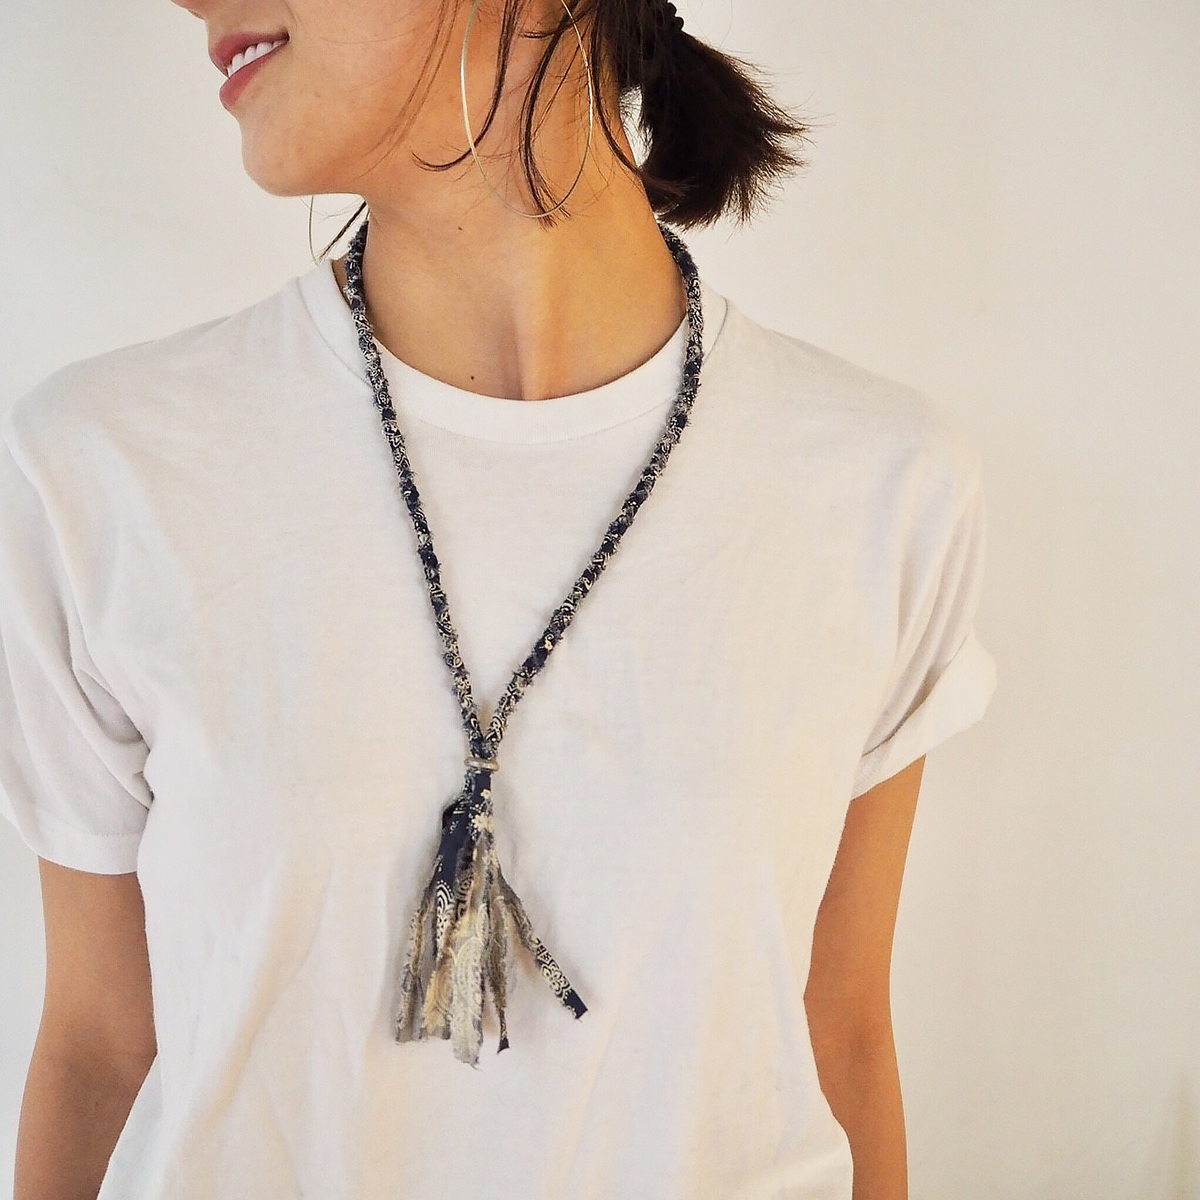 Bandanna Necklace